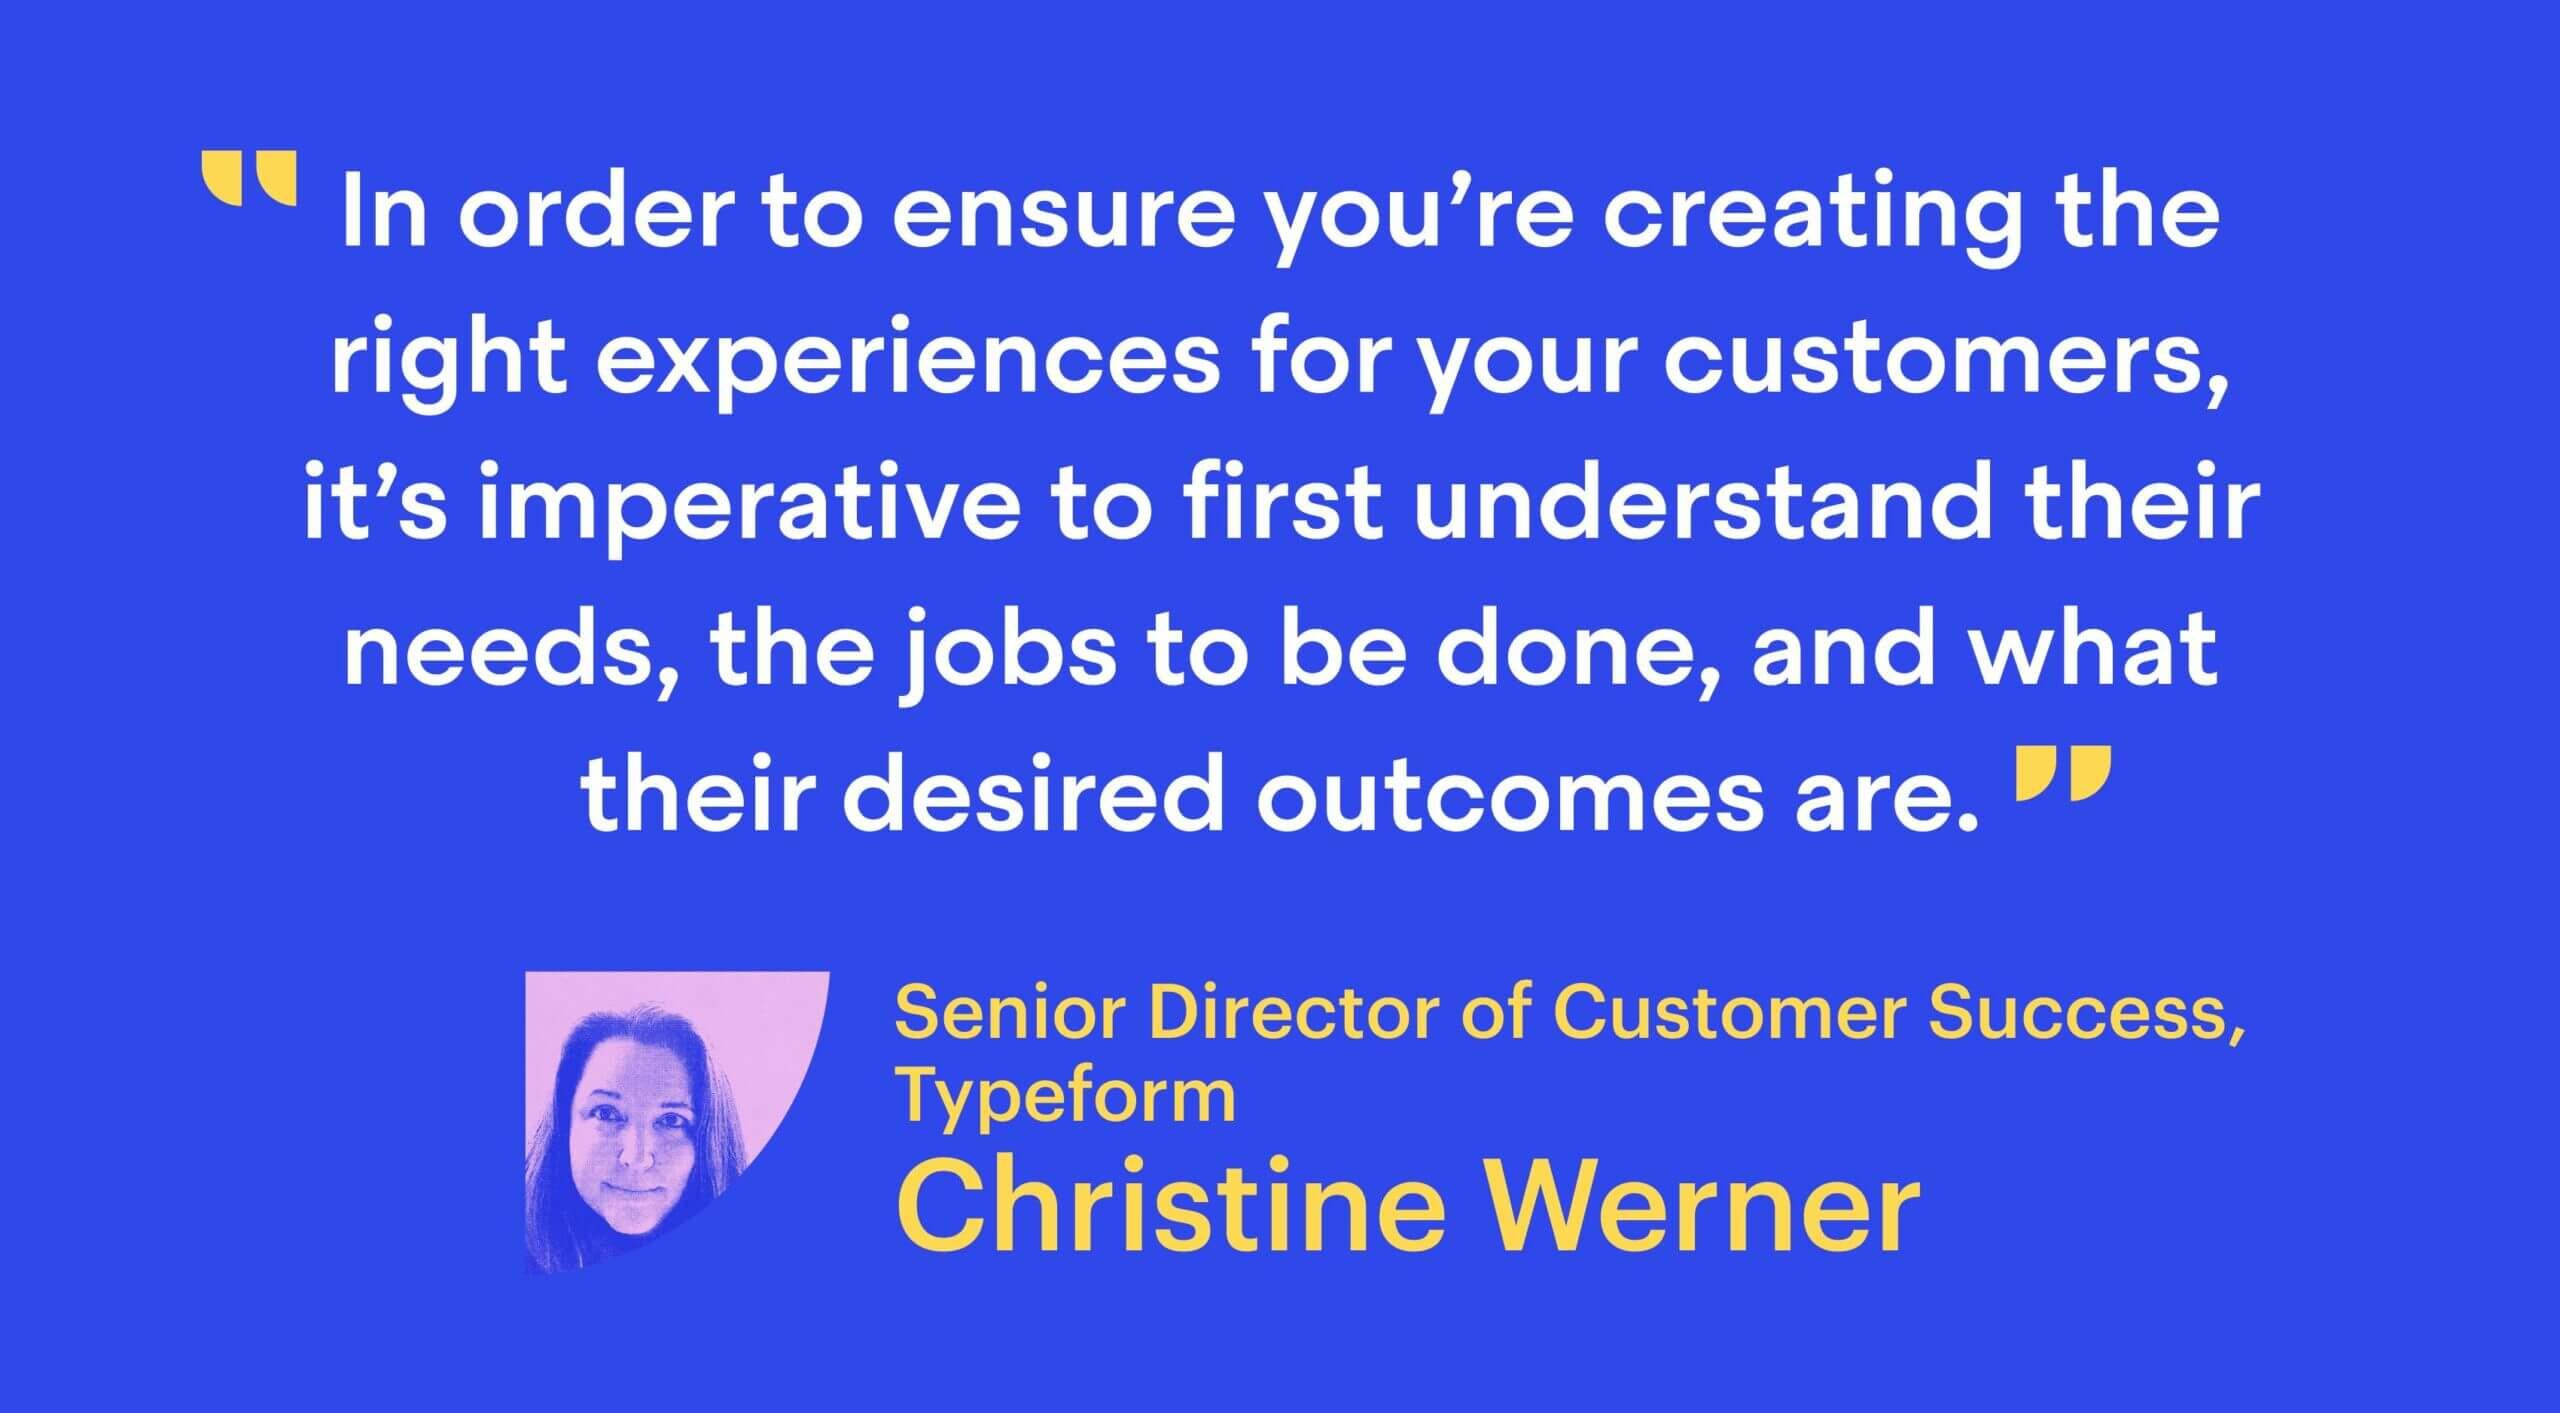 Christine Werner, Senior Director of Customer Success at Typeform